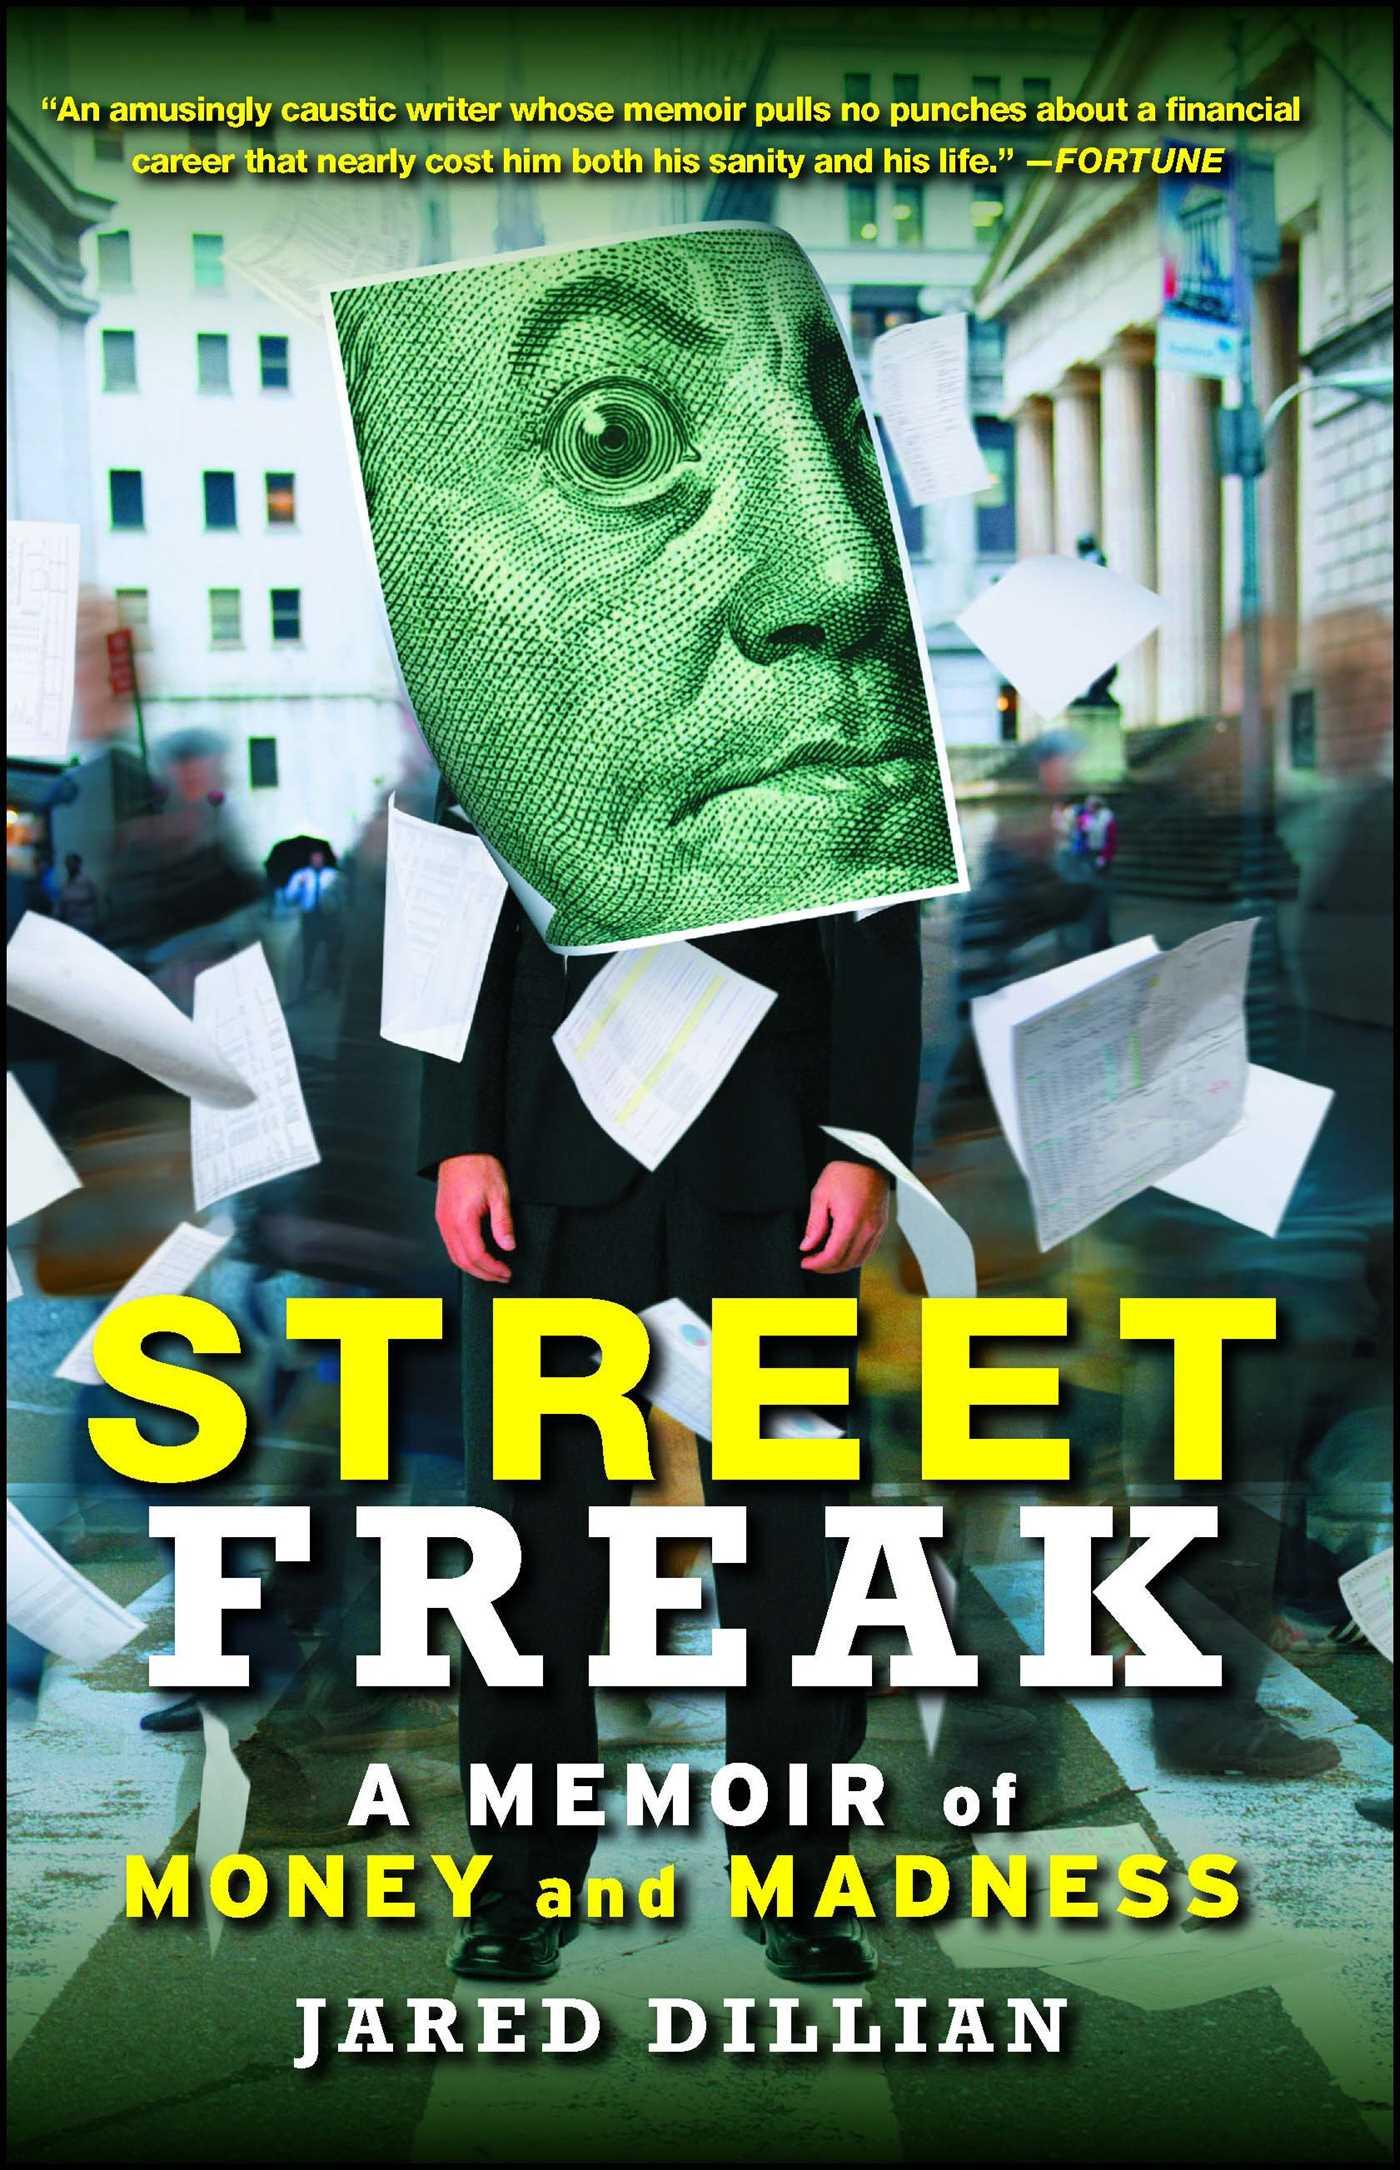 Street freak 9781439181287 hr